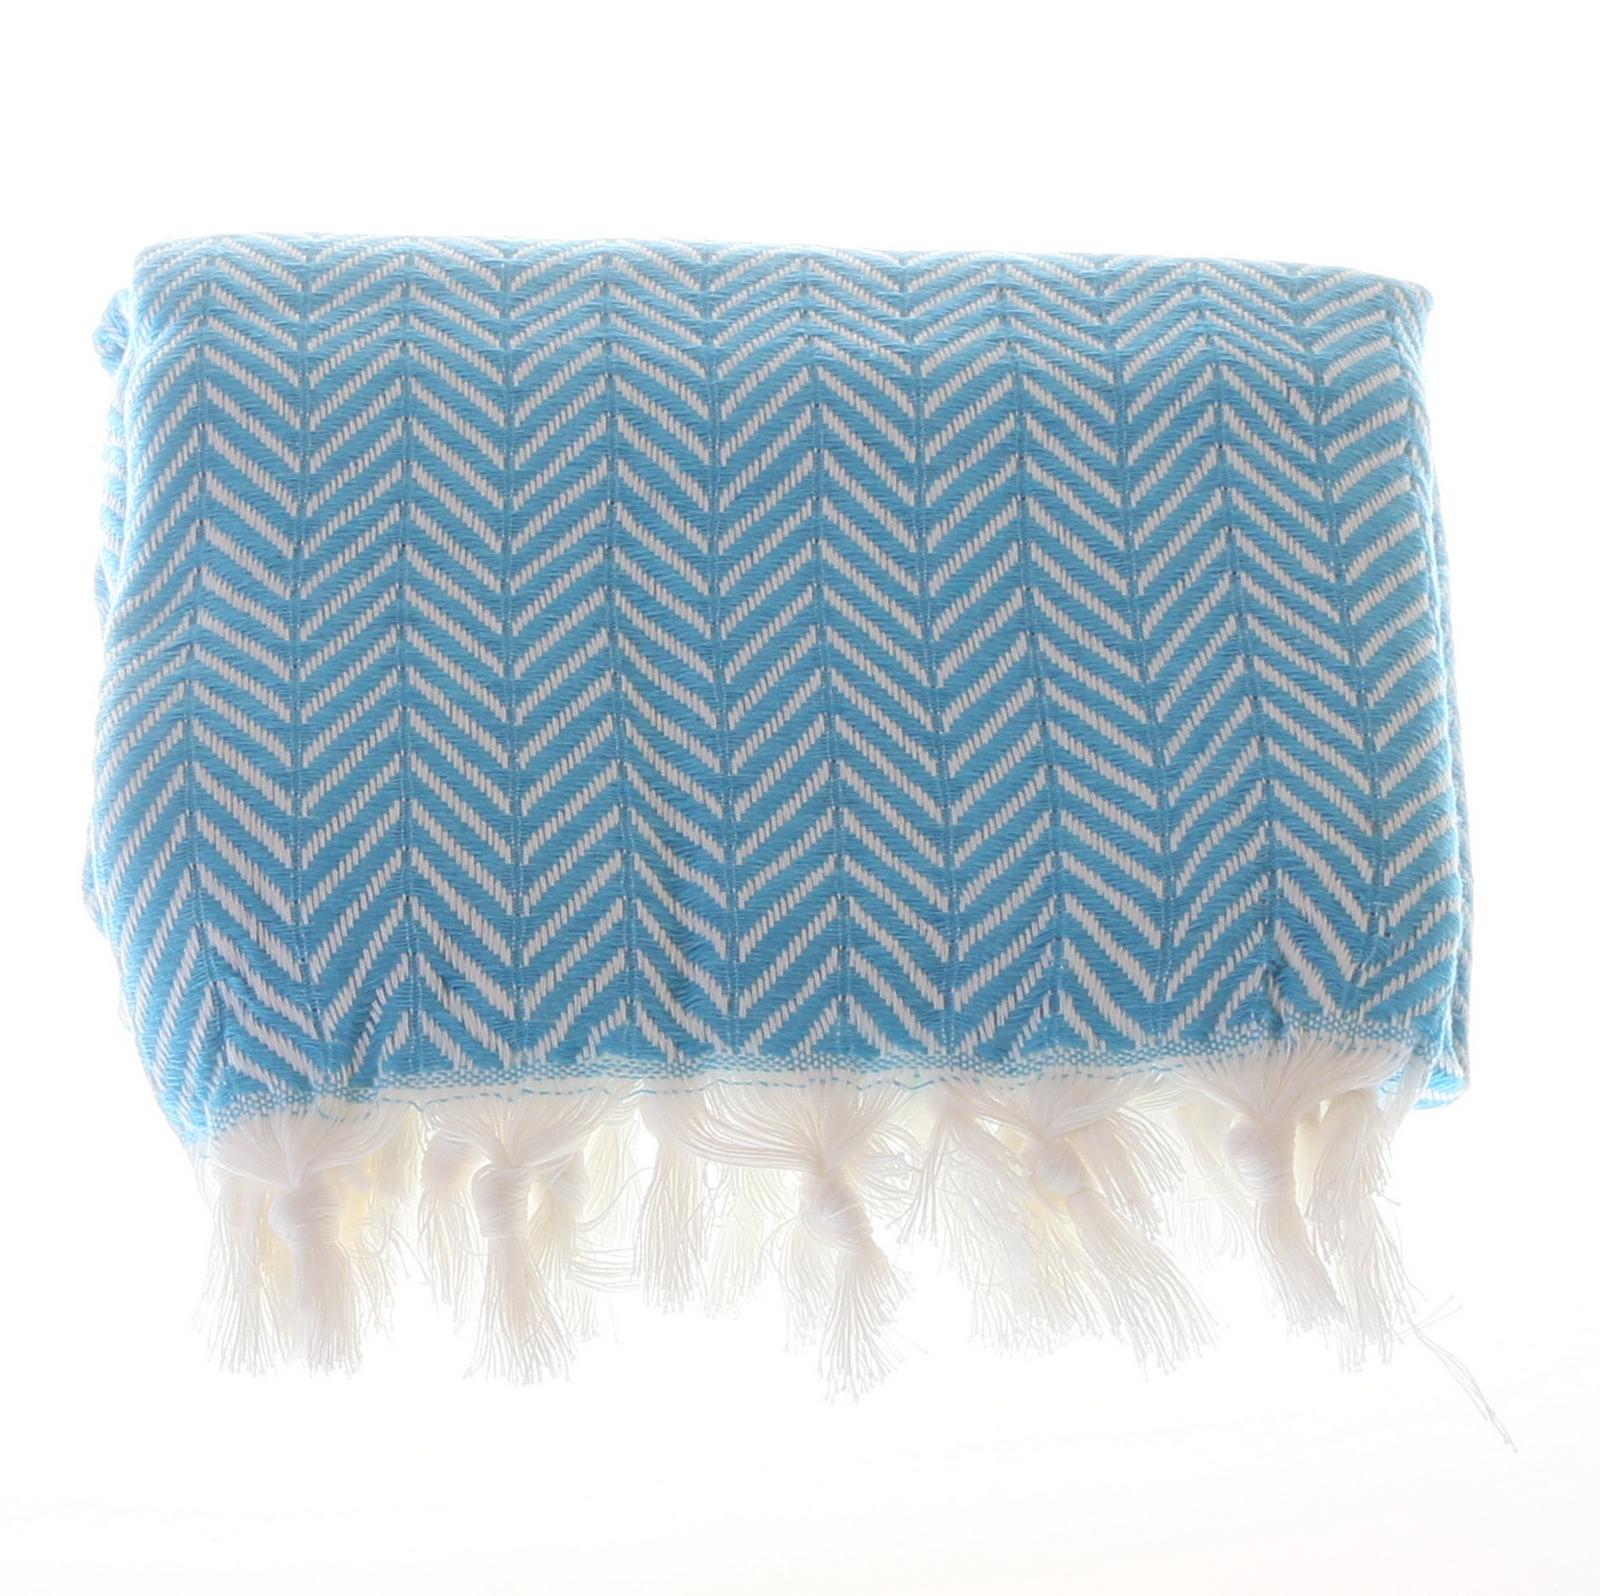 Big zigzag pattern cotton hammam towel - Light Blue